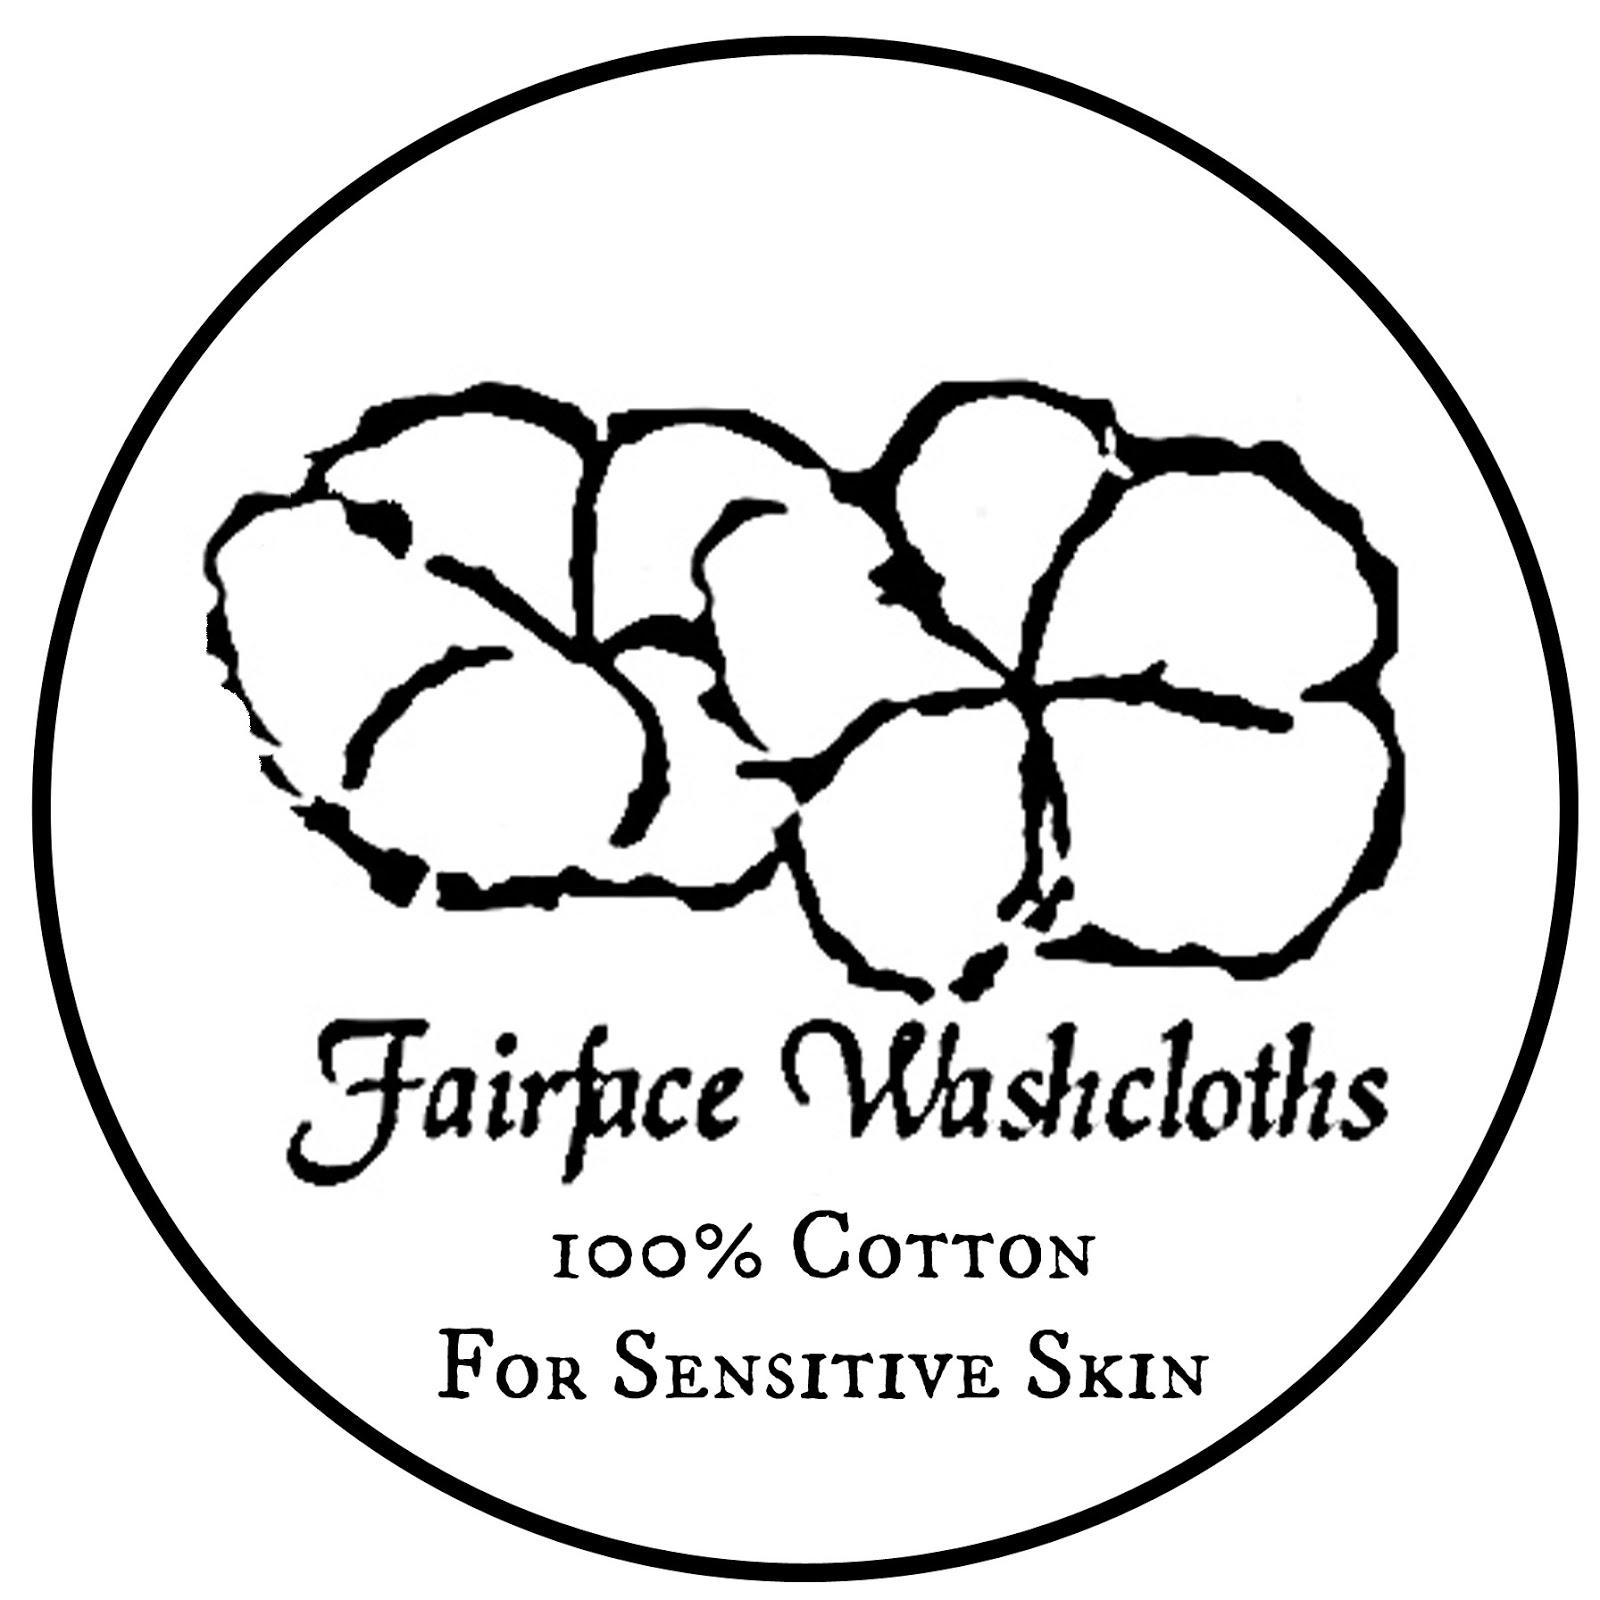 celebrity skin care best face cloths and washcloths, soft, gentle, rosacea